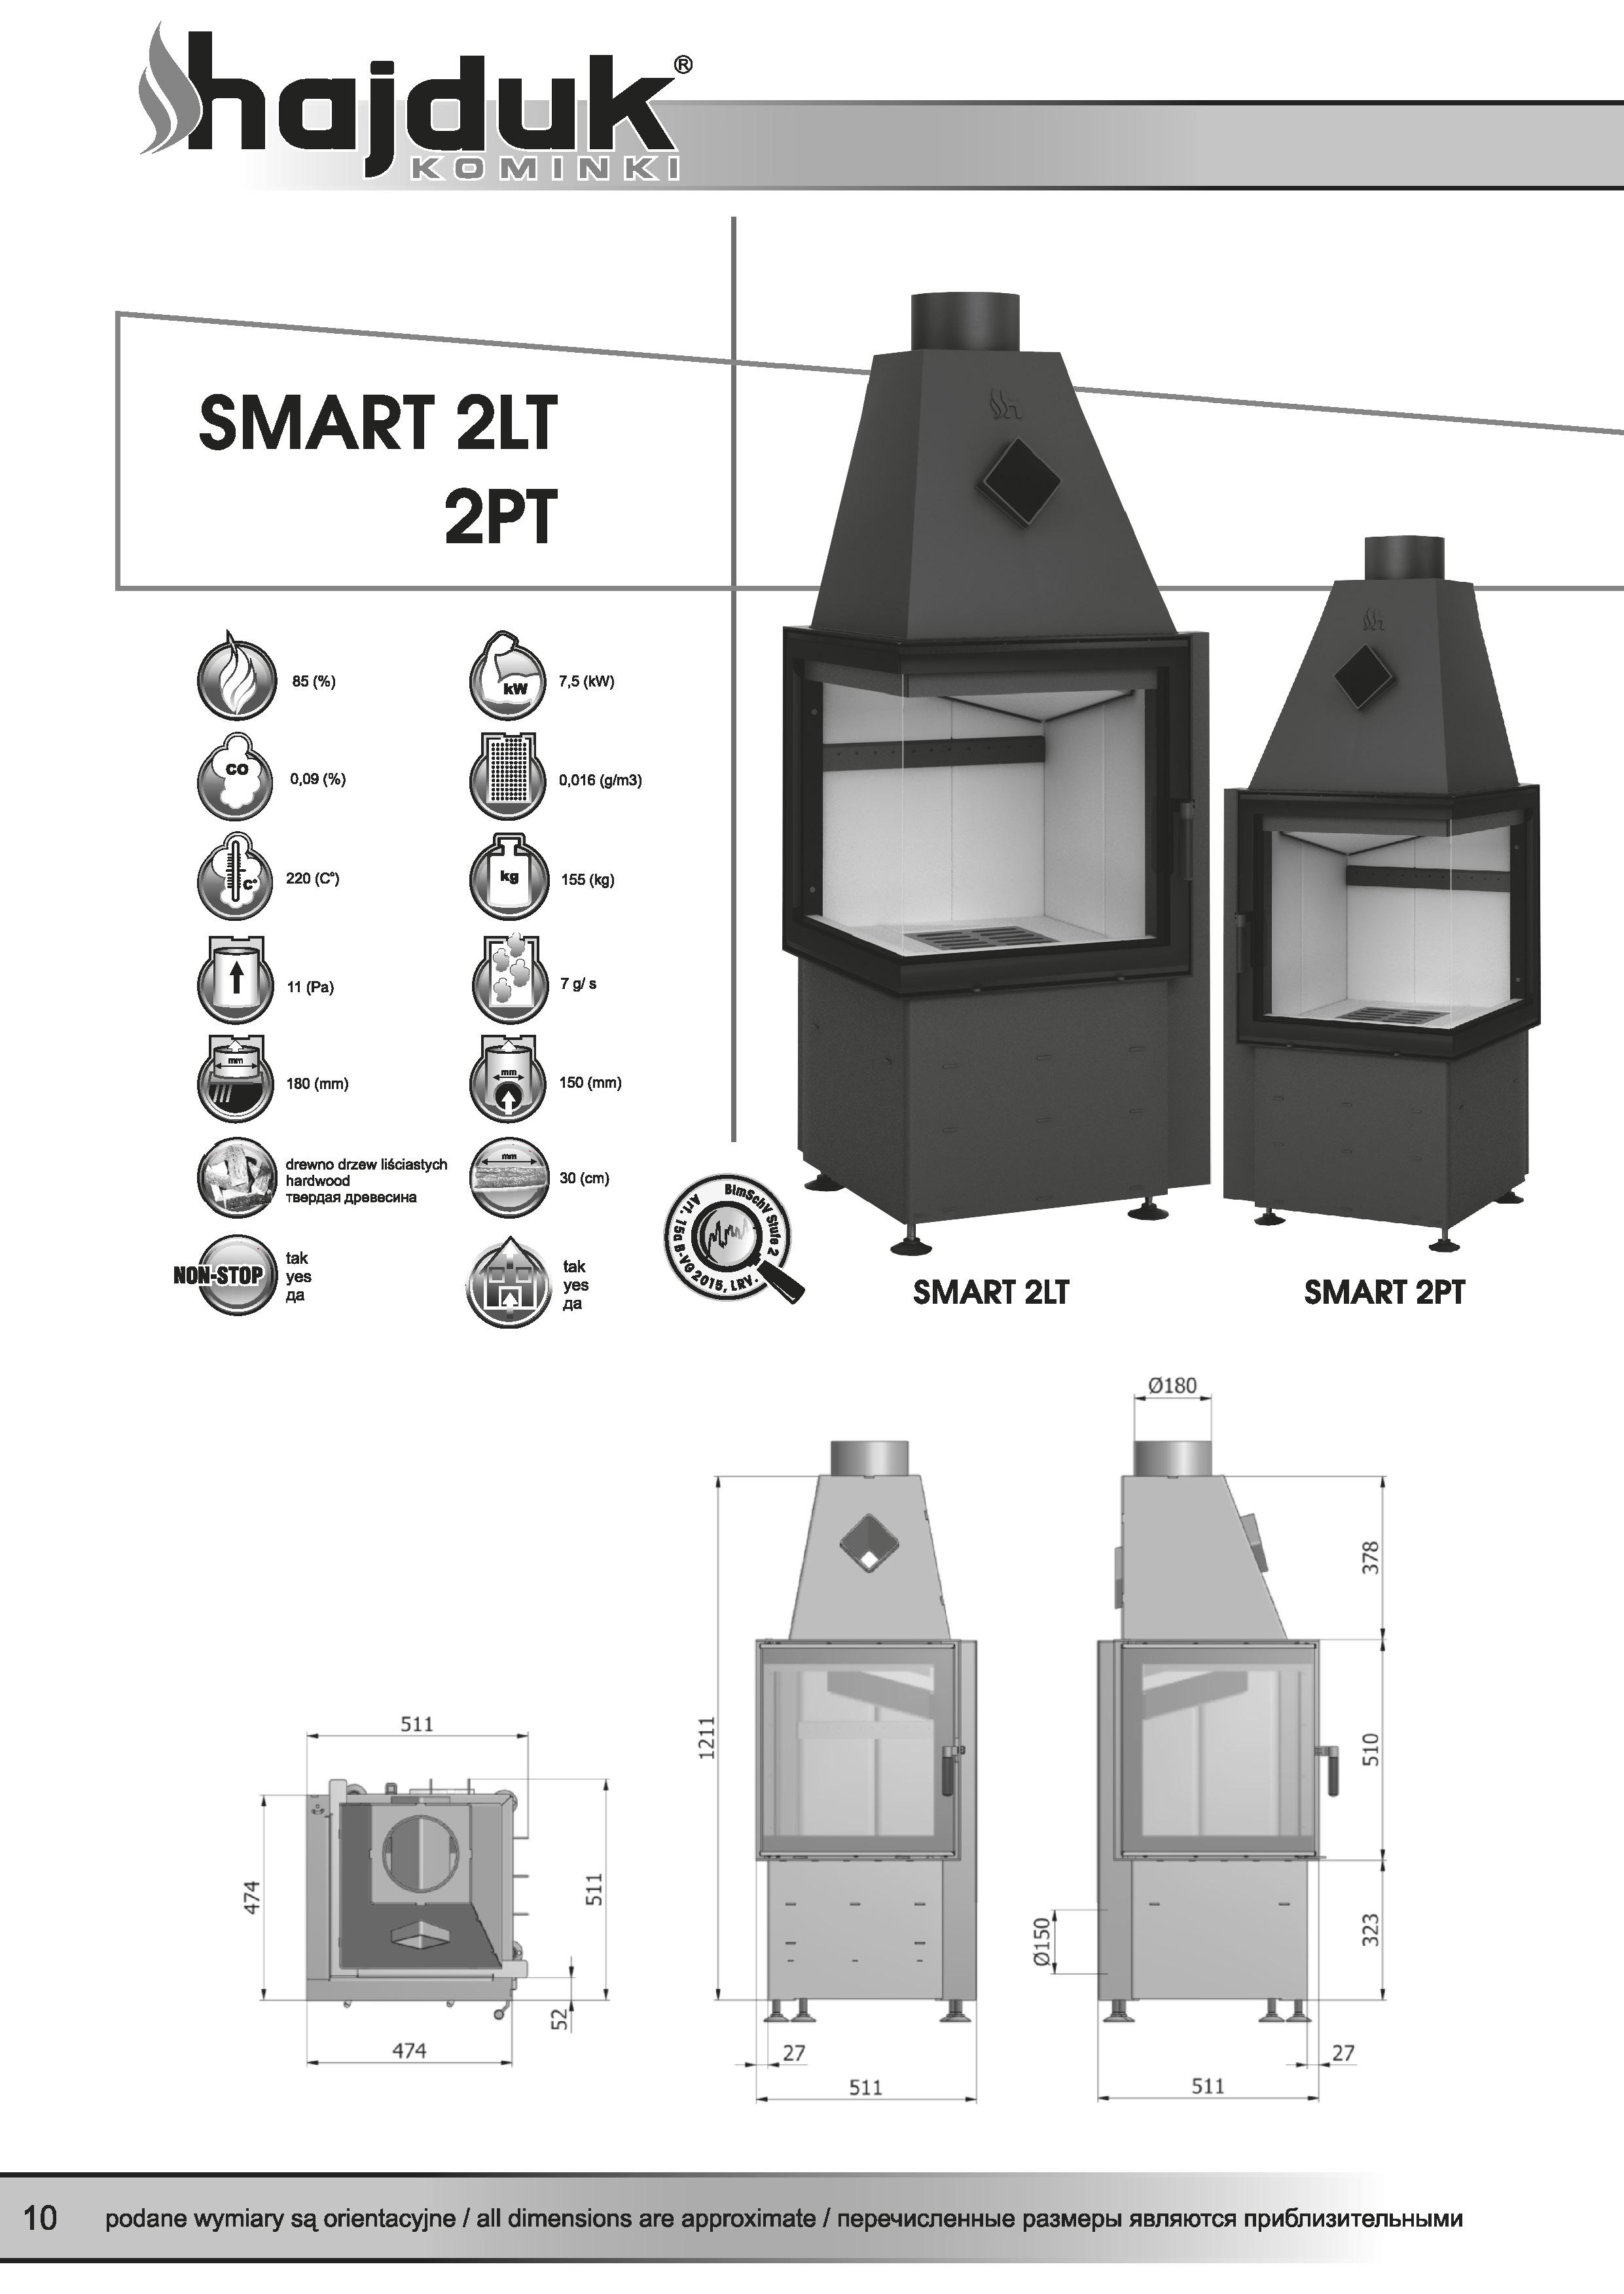 Smart%202LT%202PT%20 %20karta%20techniczna - Fireplace insert Hajduk Smart 2LT